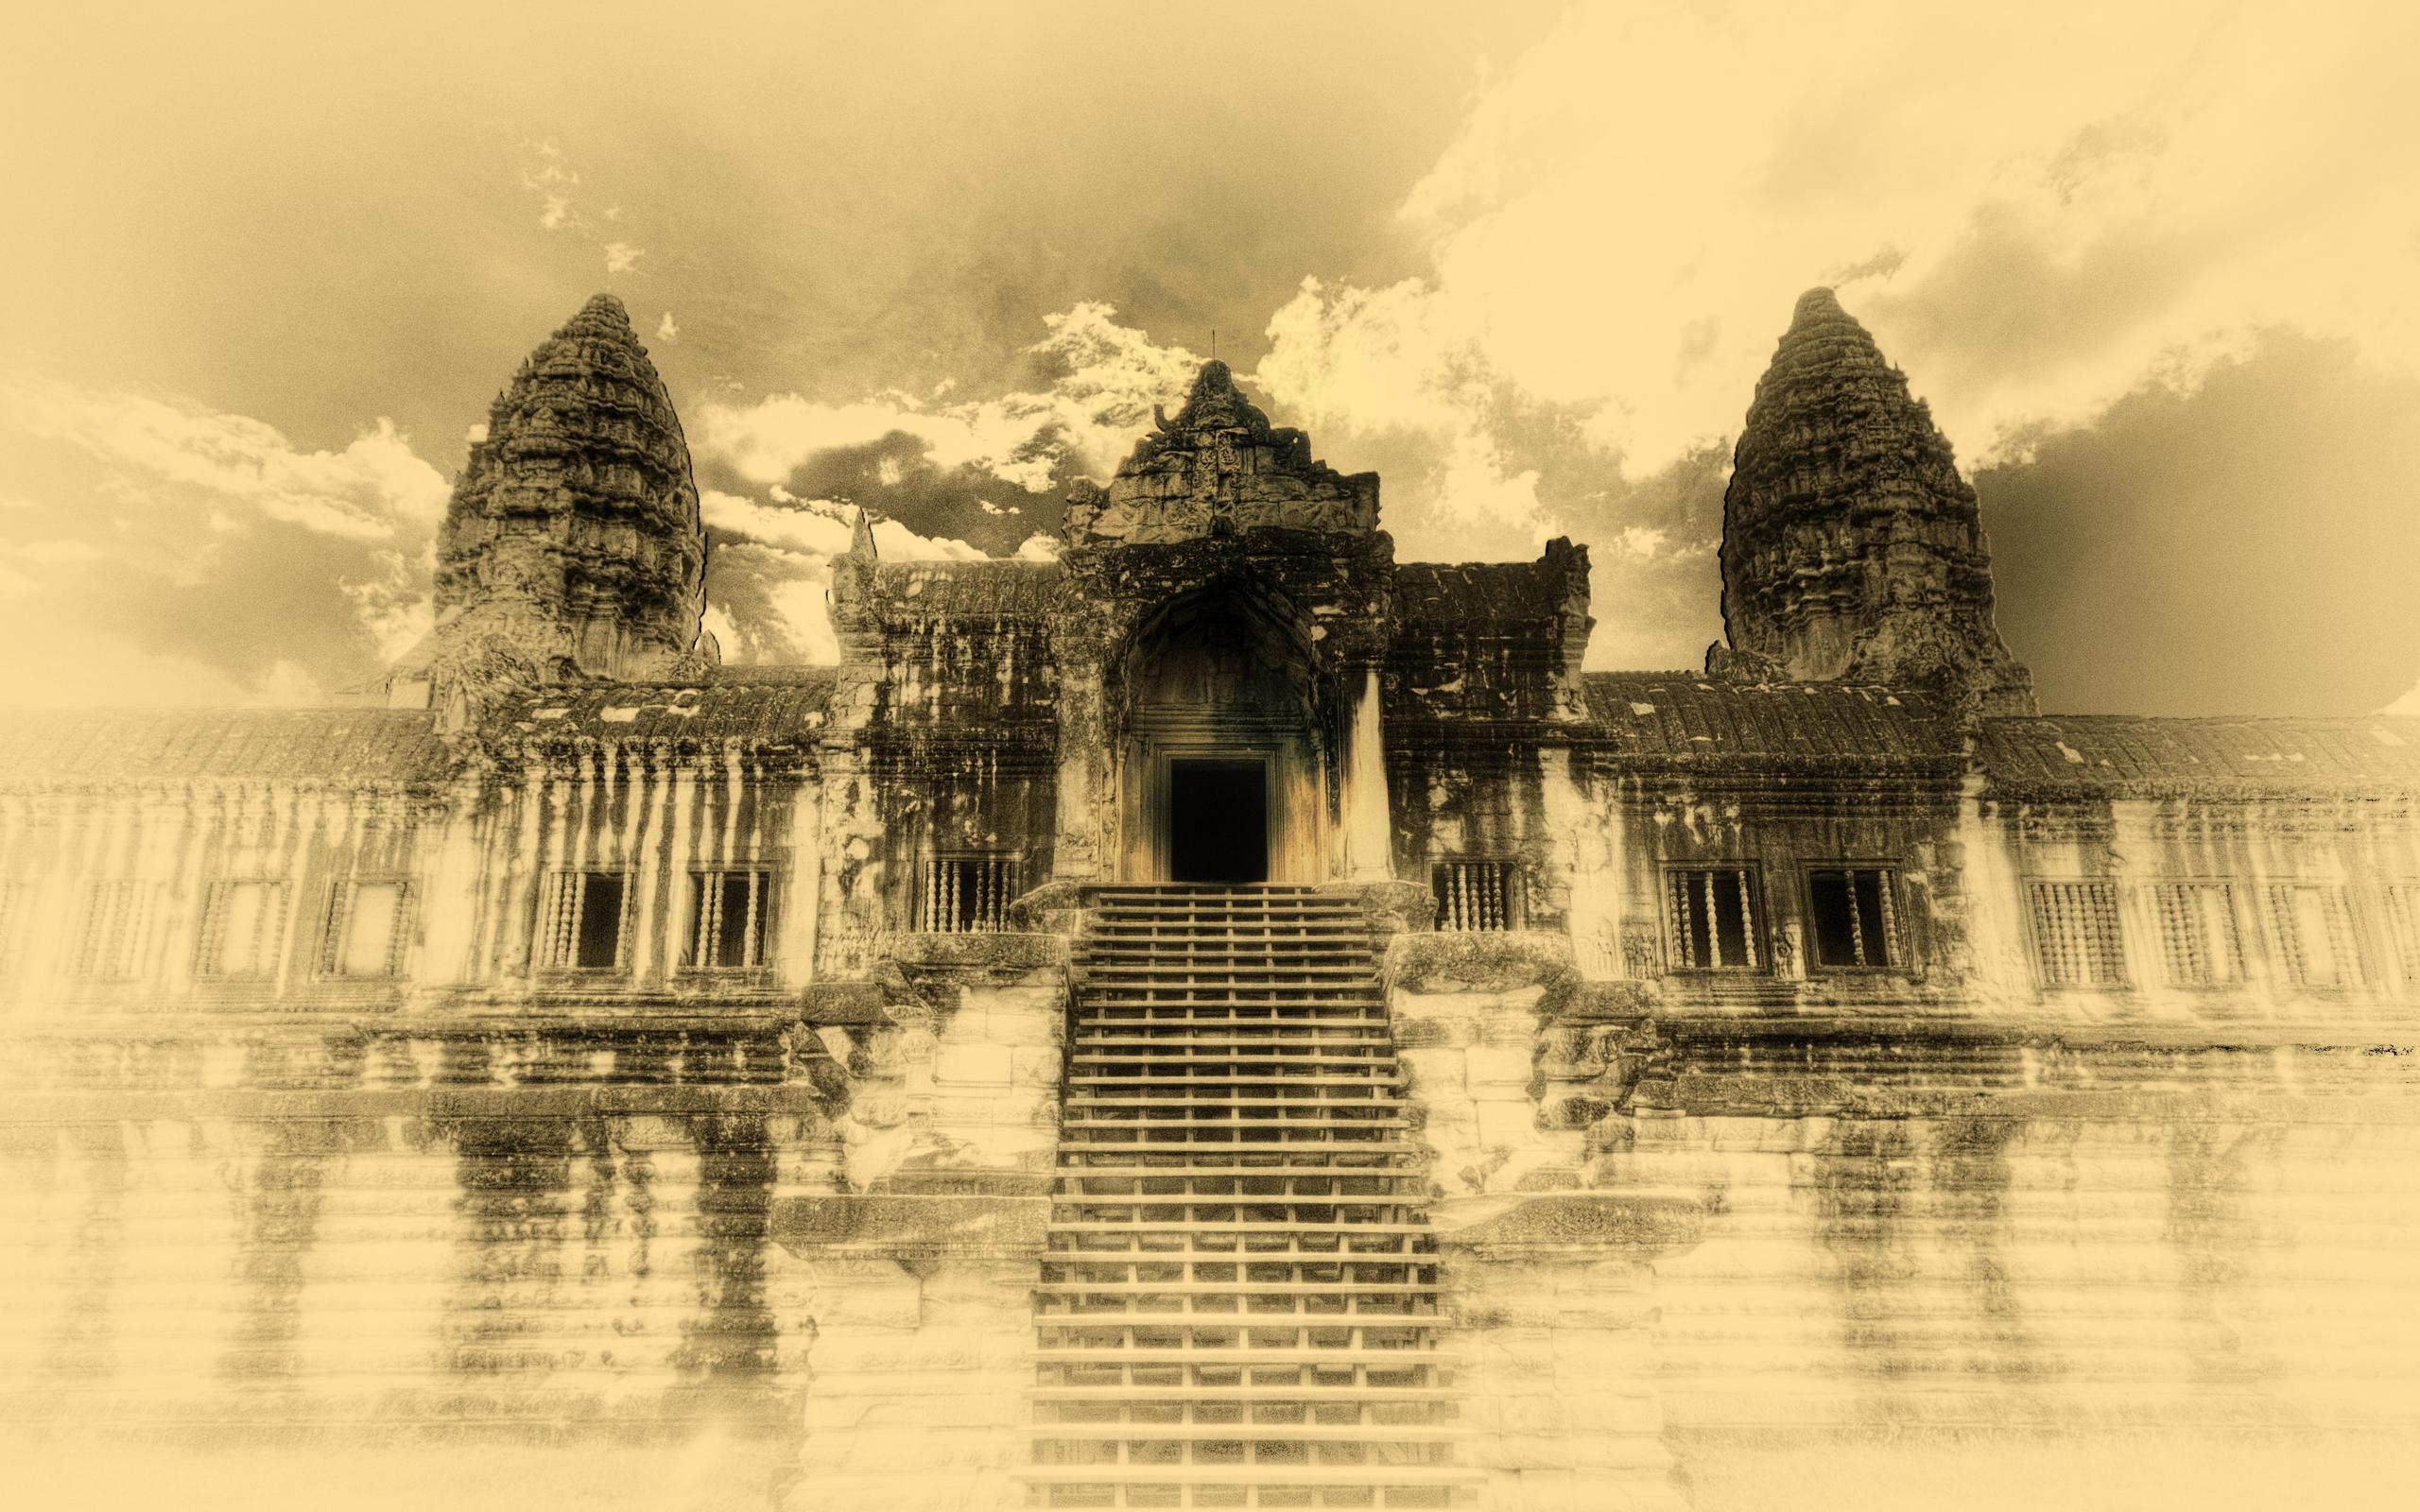 Awesome Hd Wallpapers For Mac Angkor Wat Desktop Background Pixelstalk Net